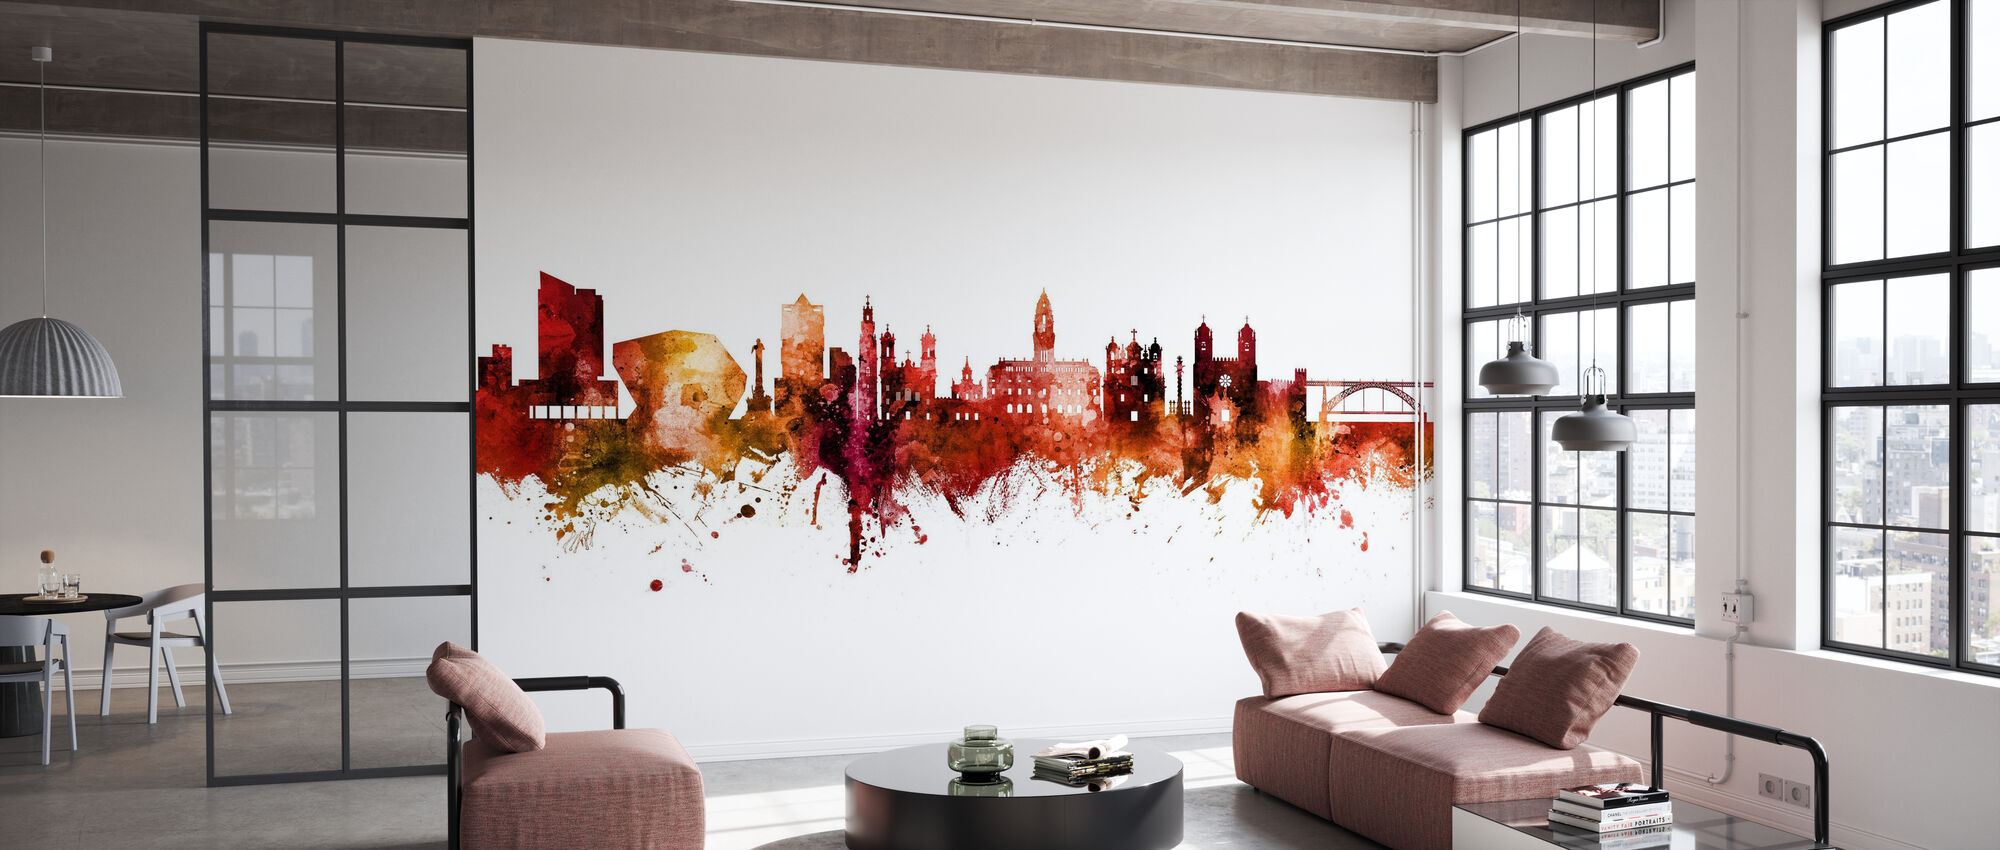 Porto Portugal Skyline - Wallpaper - Office